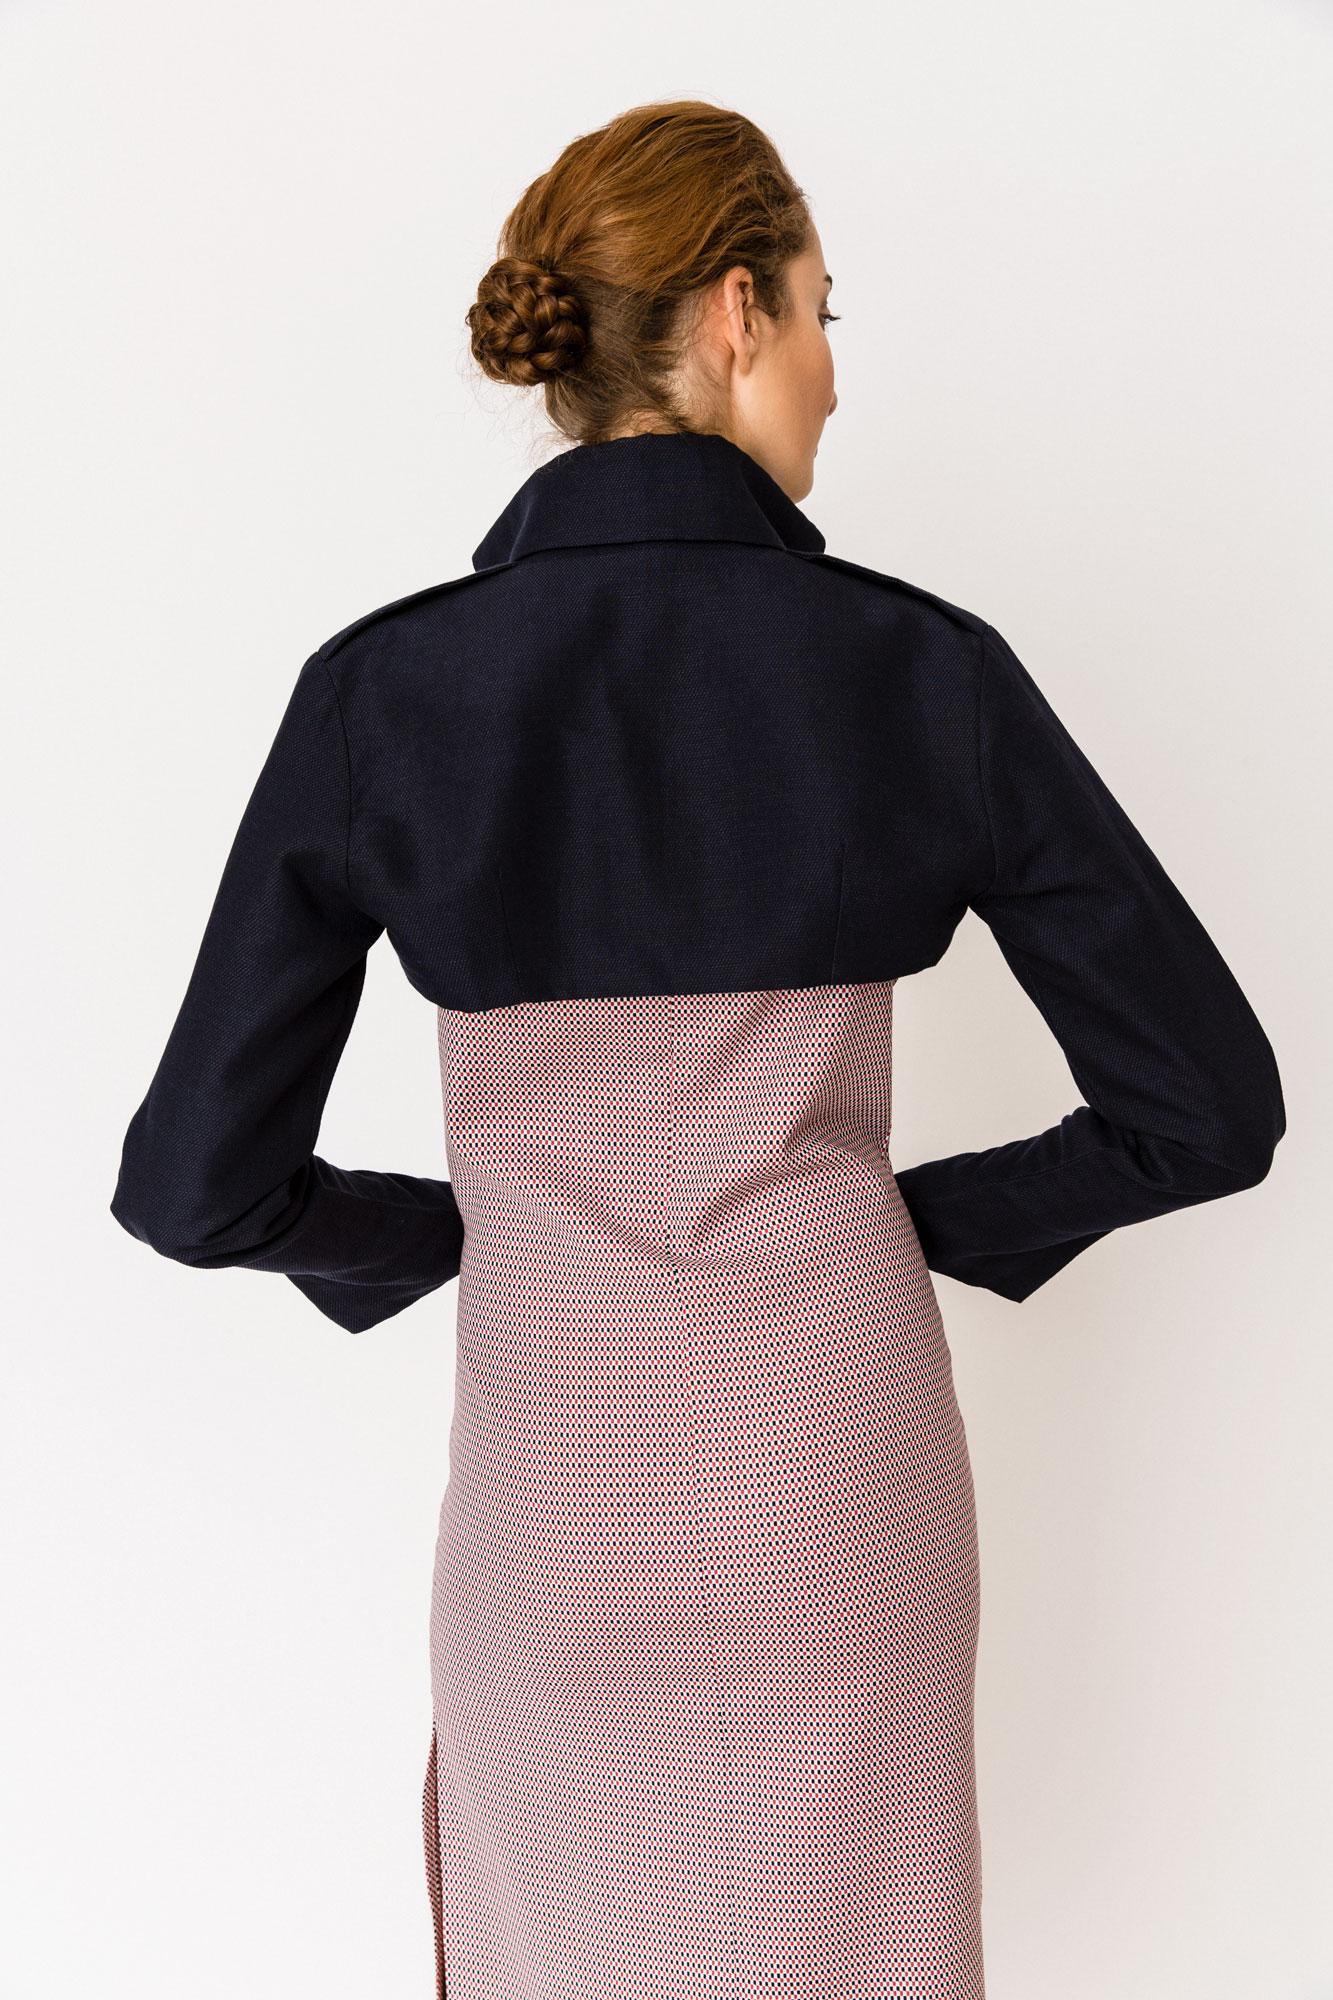 S18-04Inspect_Dress5